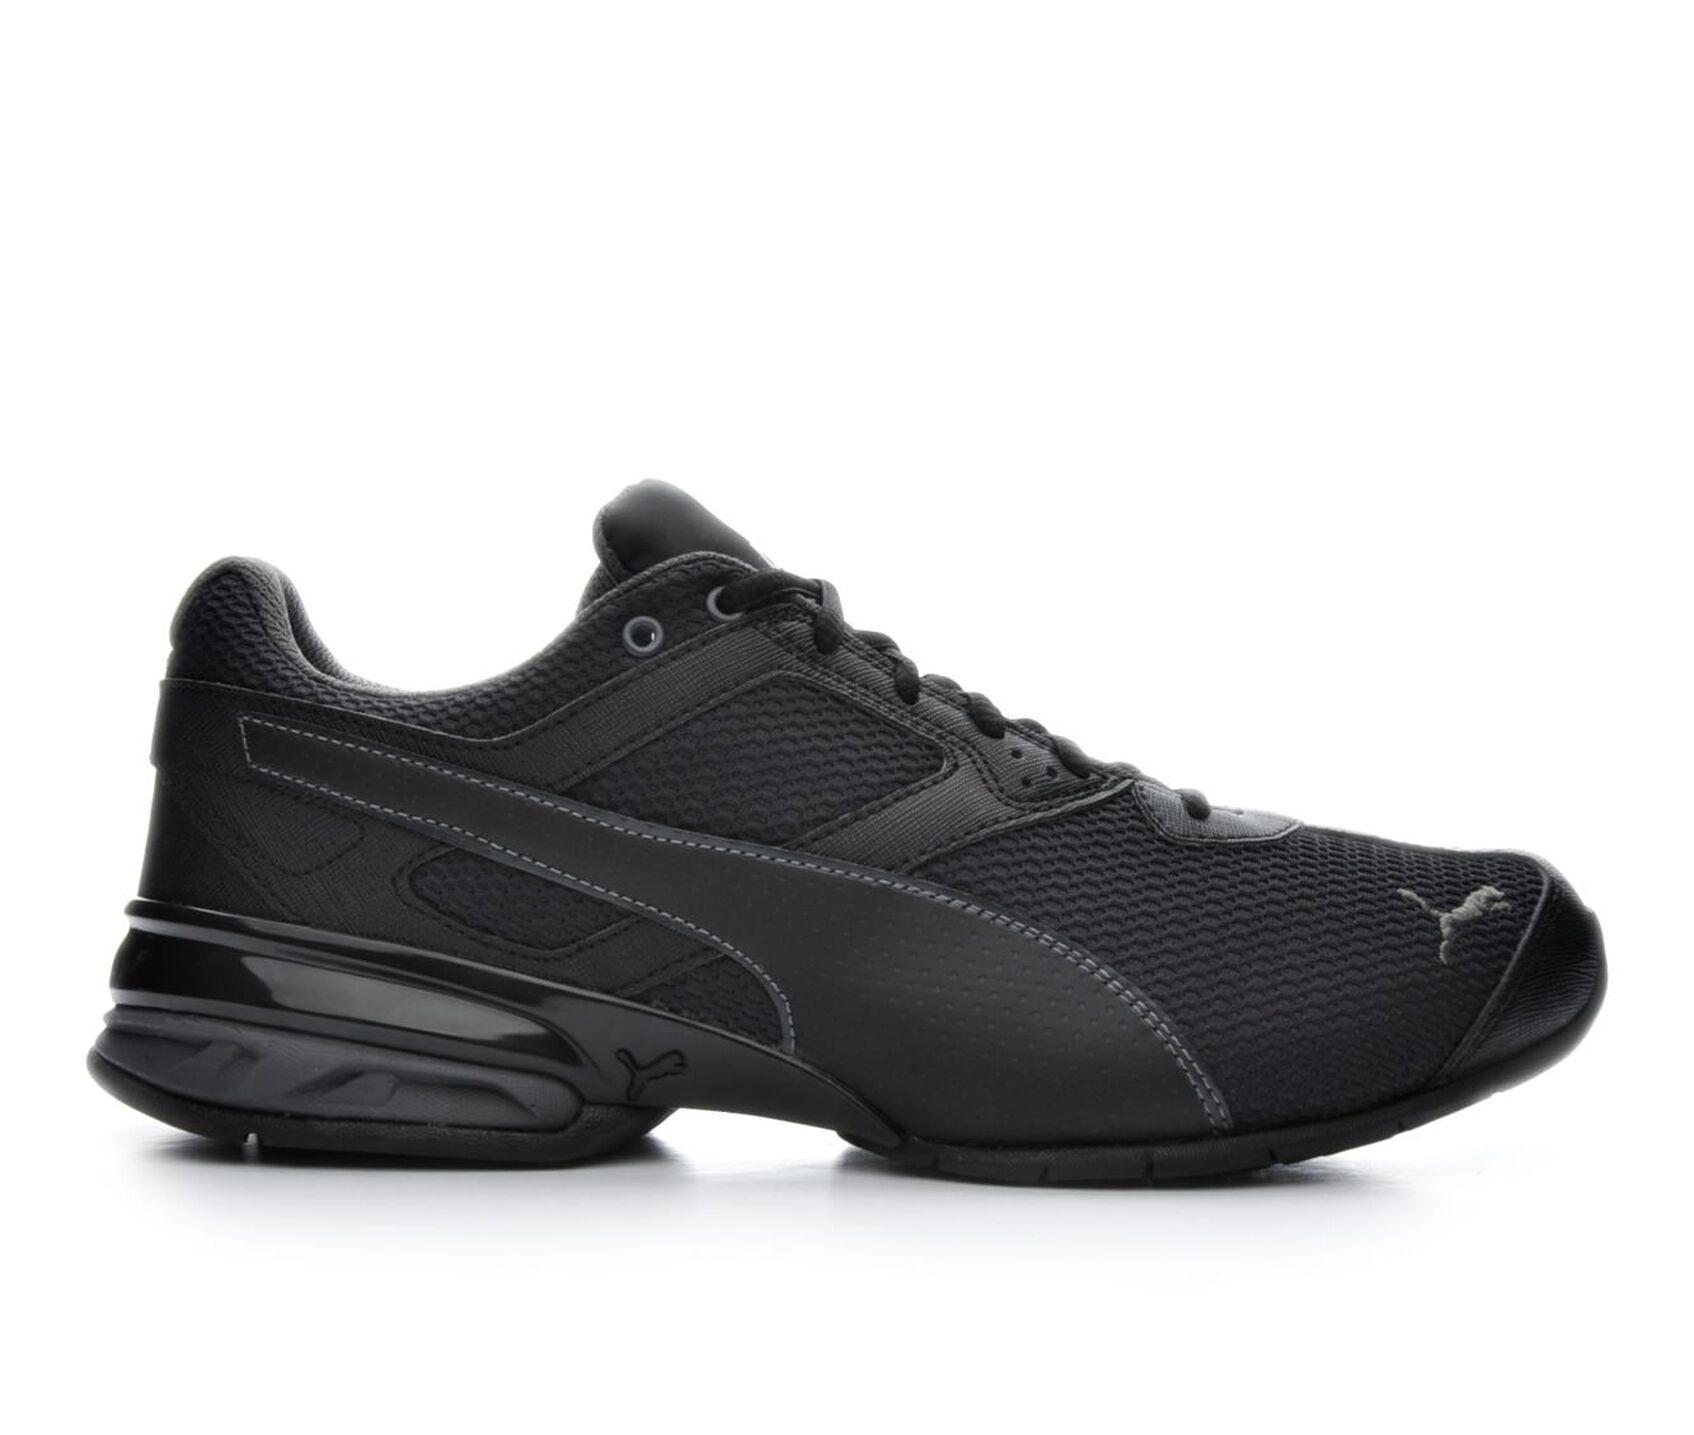 cbc8cd3db9a2b3 Images. Men  39 s Puma Tazon 6 Mesh Sneakers